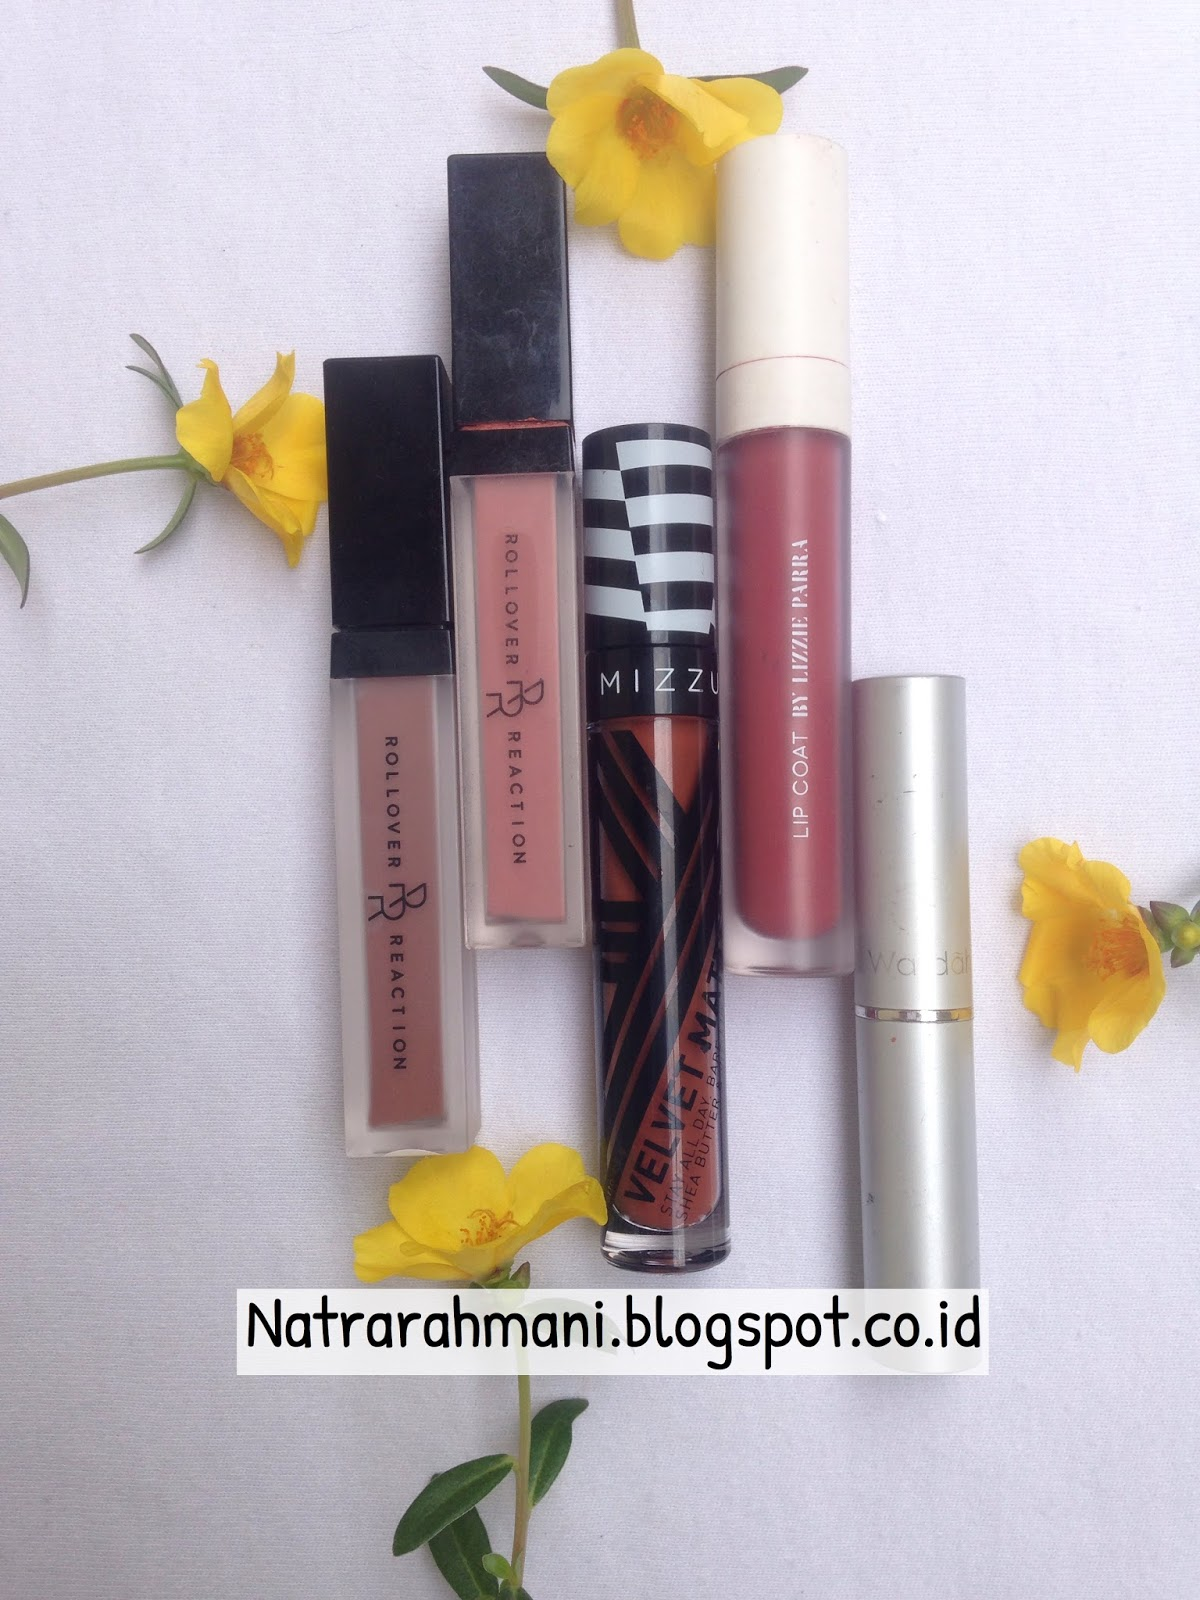 Dari Judulnya post ini sebenarnya 5 lipstick tapi satu lipstick lagi ternyata kelupaan masuk di poto Oh maafkan mamak yang pelupa ini